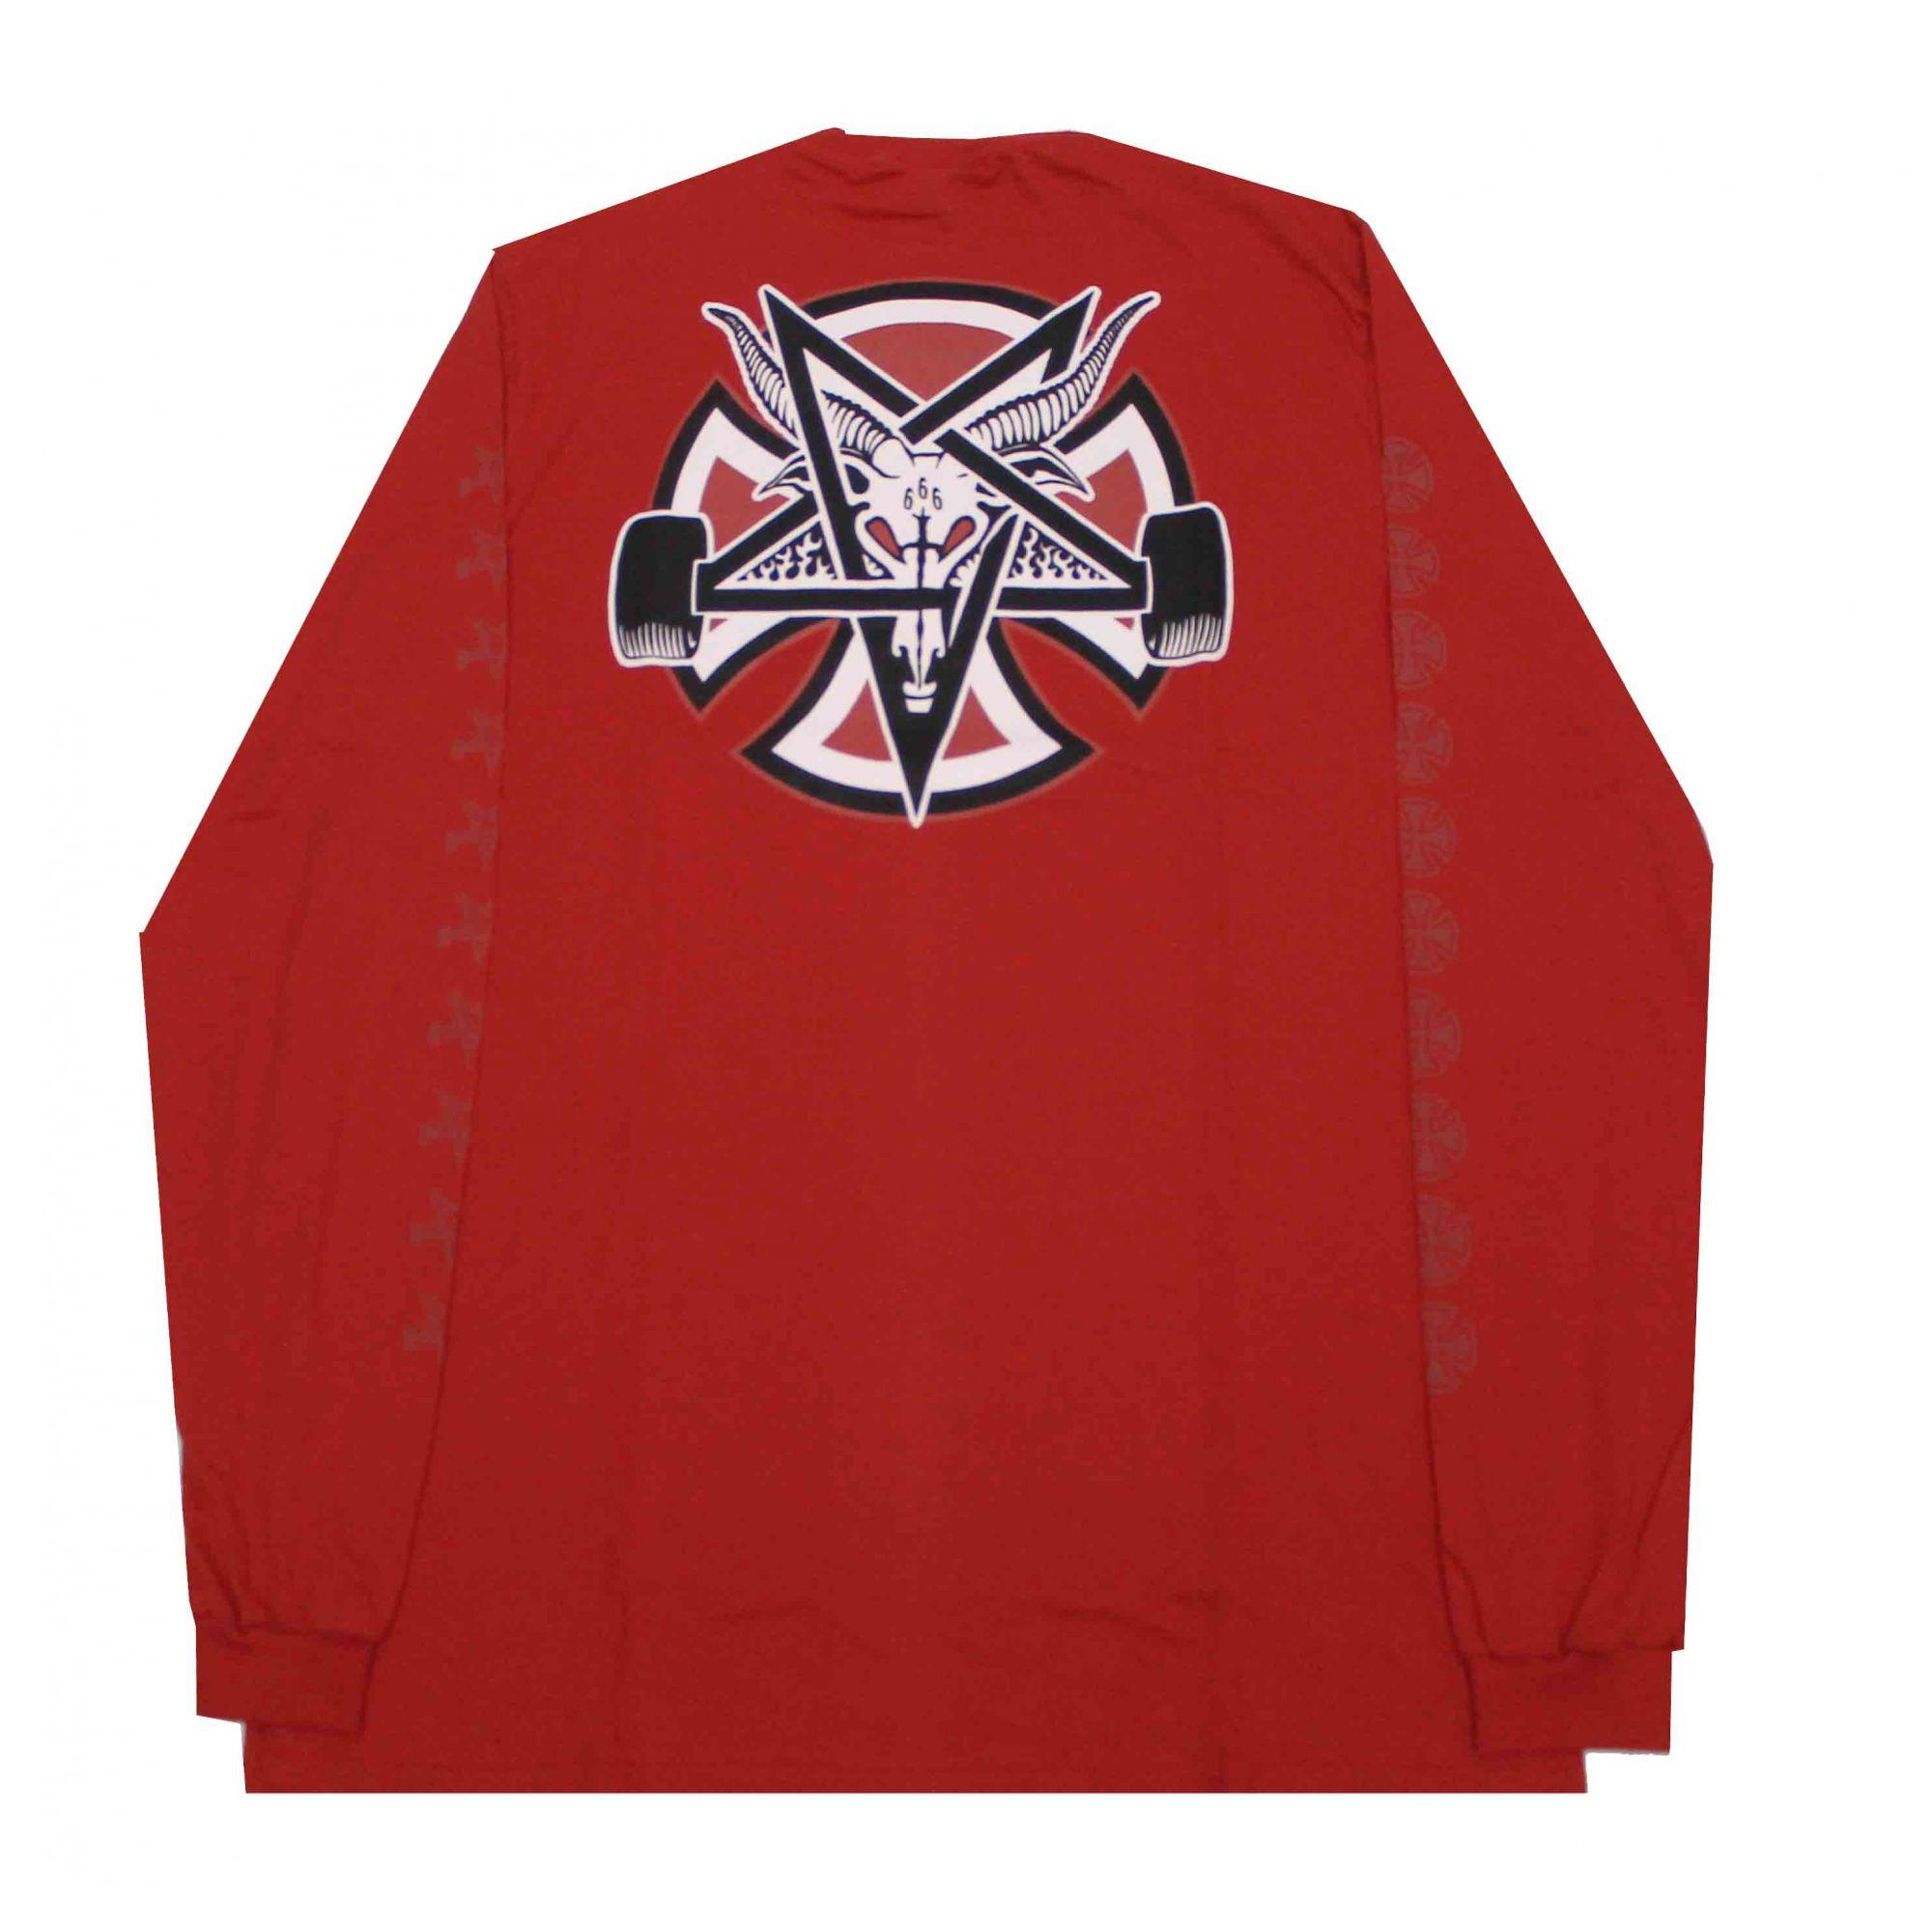 Camiseta Manga Longa Thrasher Magazine x Independent Pentagram Cross - Vermelho